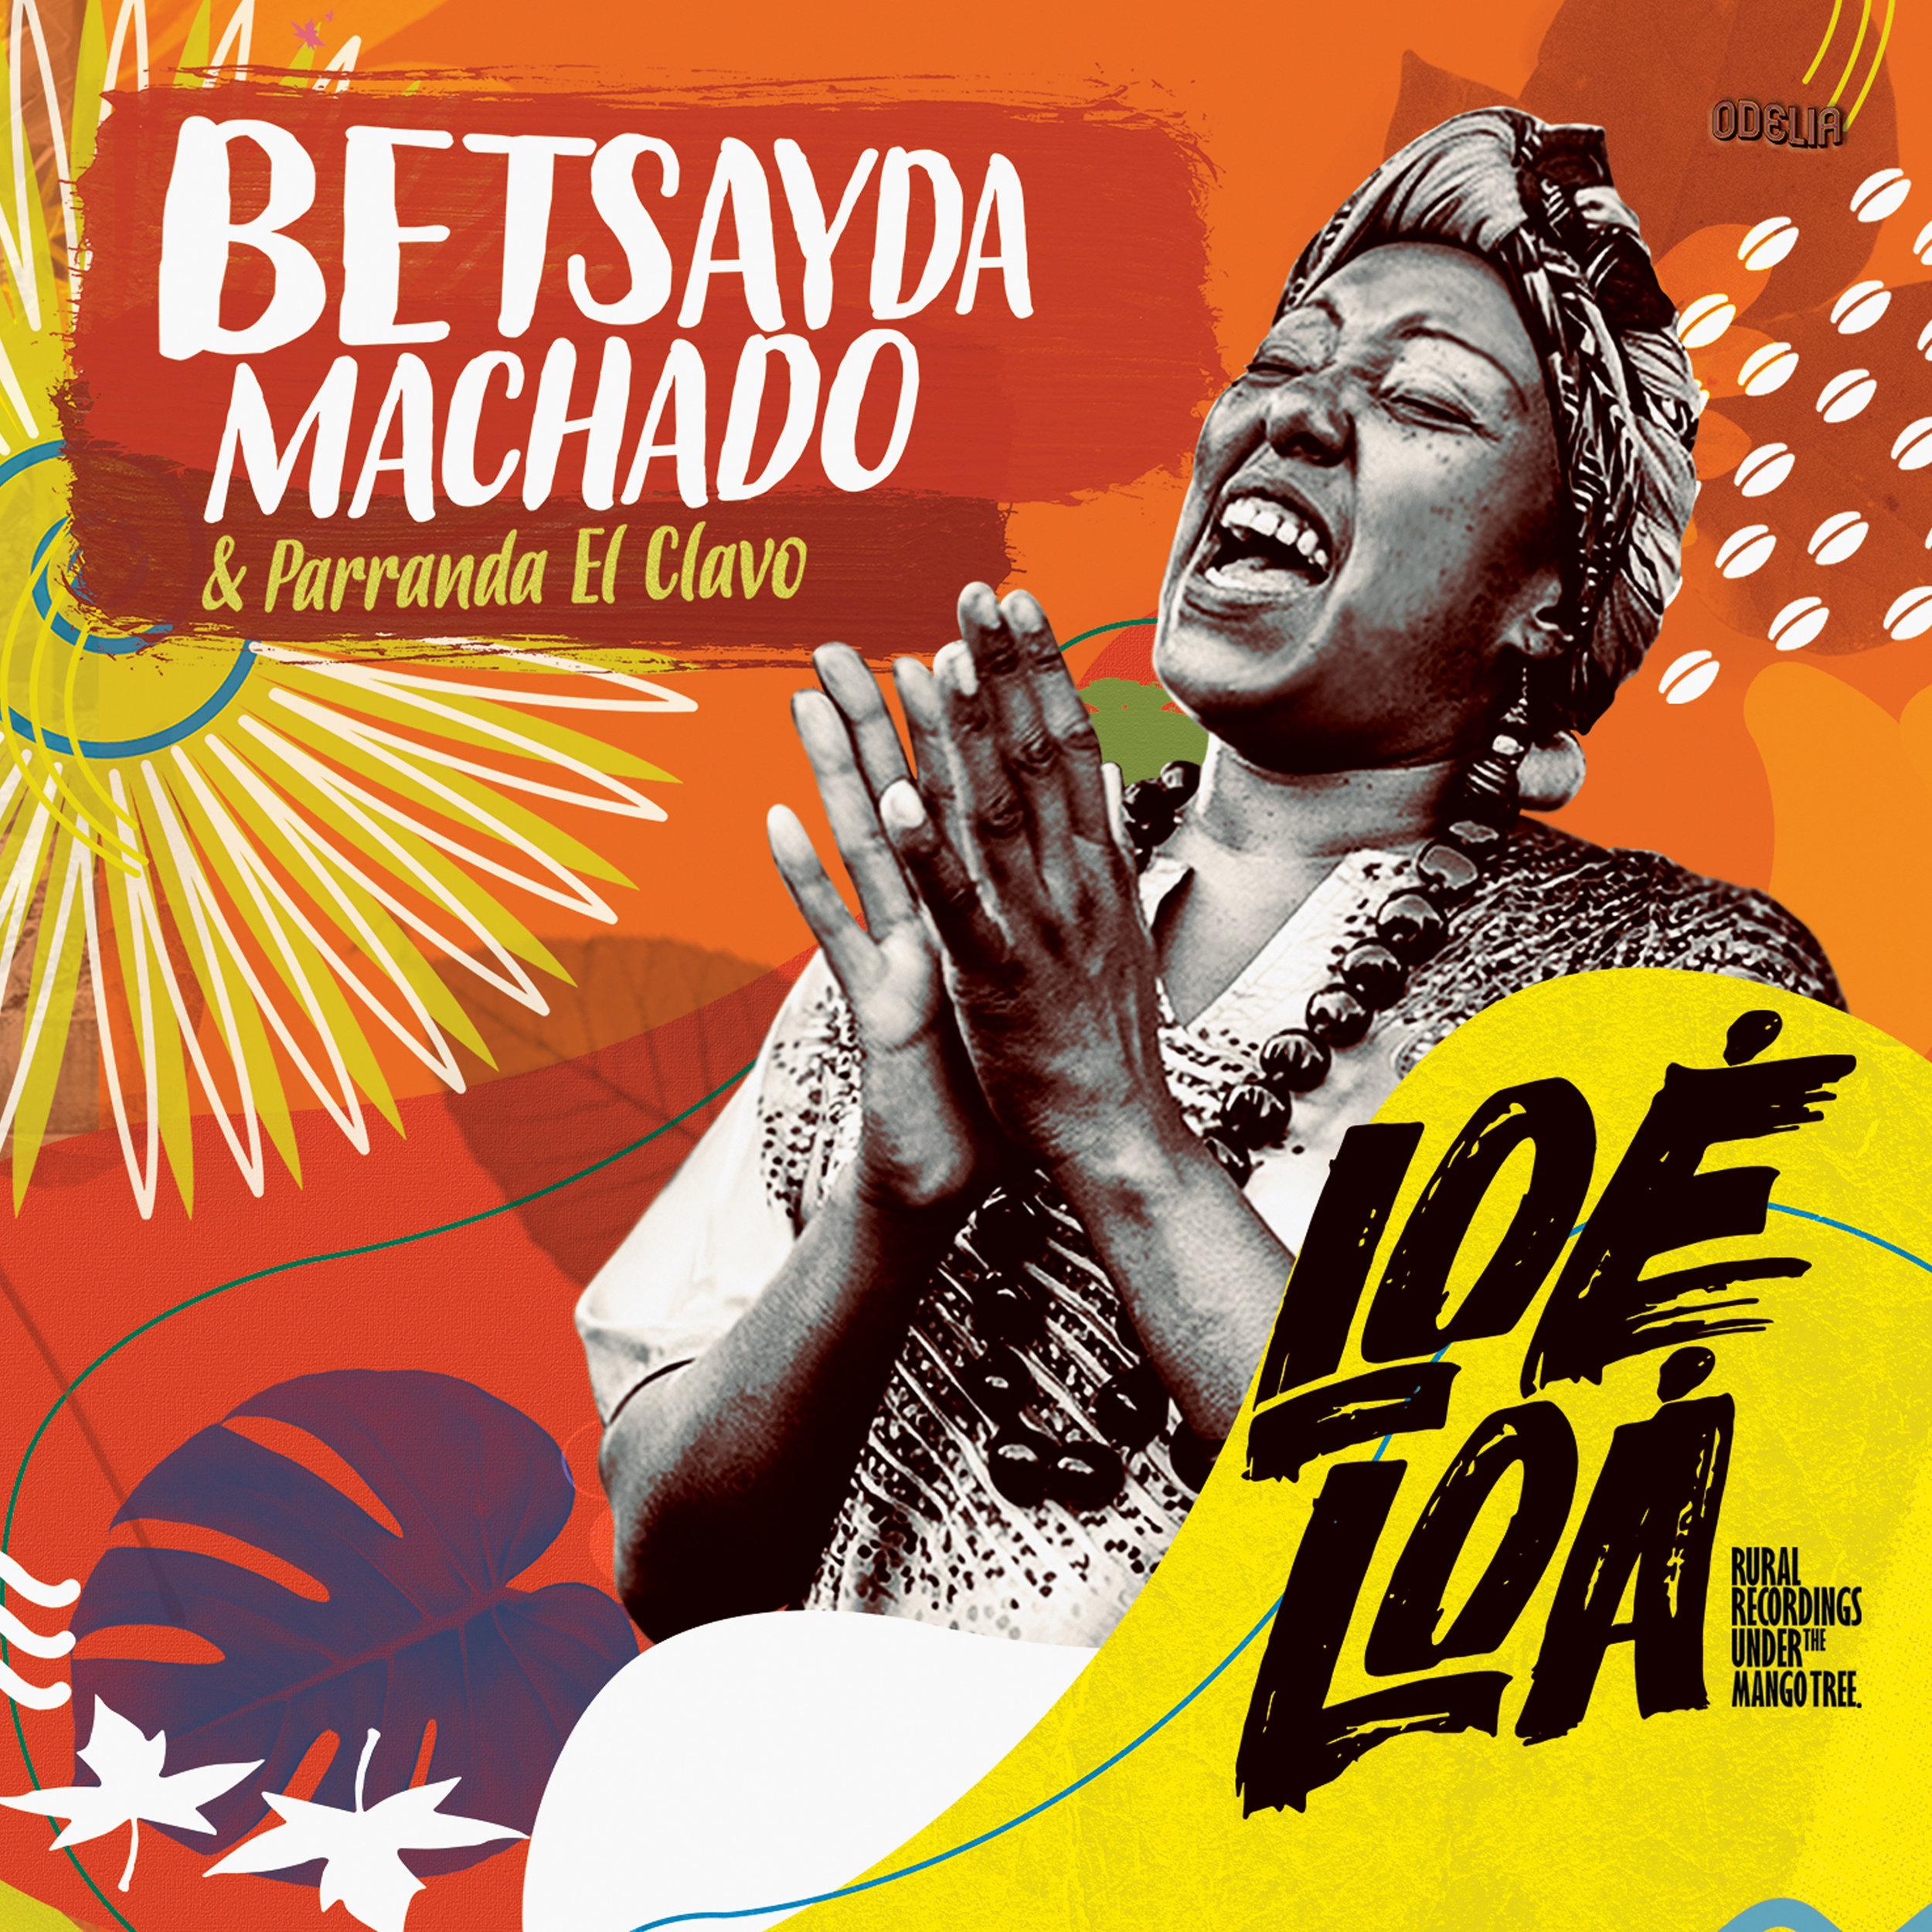 Loe-Loa-Betsayda-Machado-3000x3000.jpg